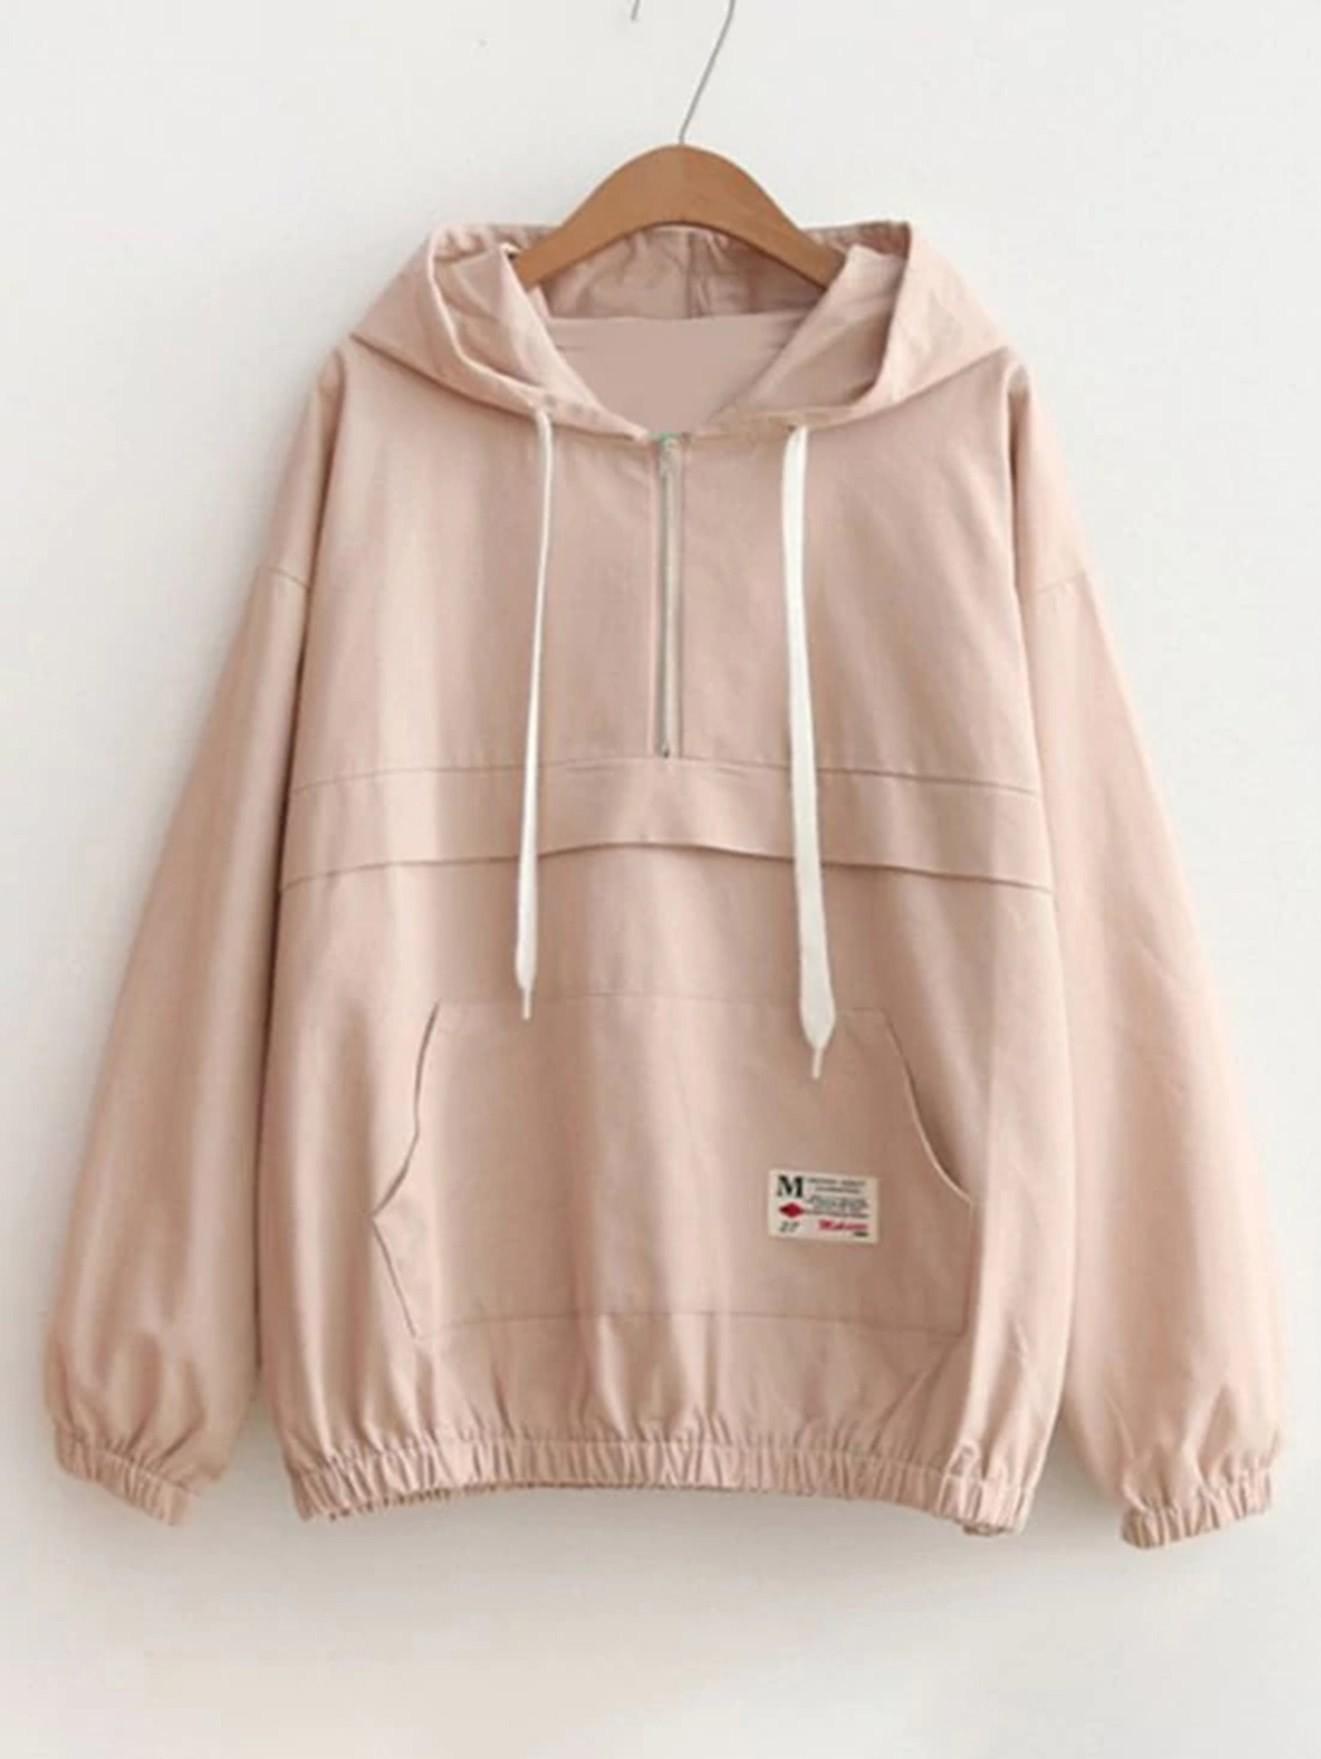 Drop Shoulder Kangaroo Pocket Anorak Jacket plus size plain drop shoulder hoodie with pocket